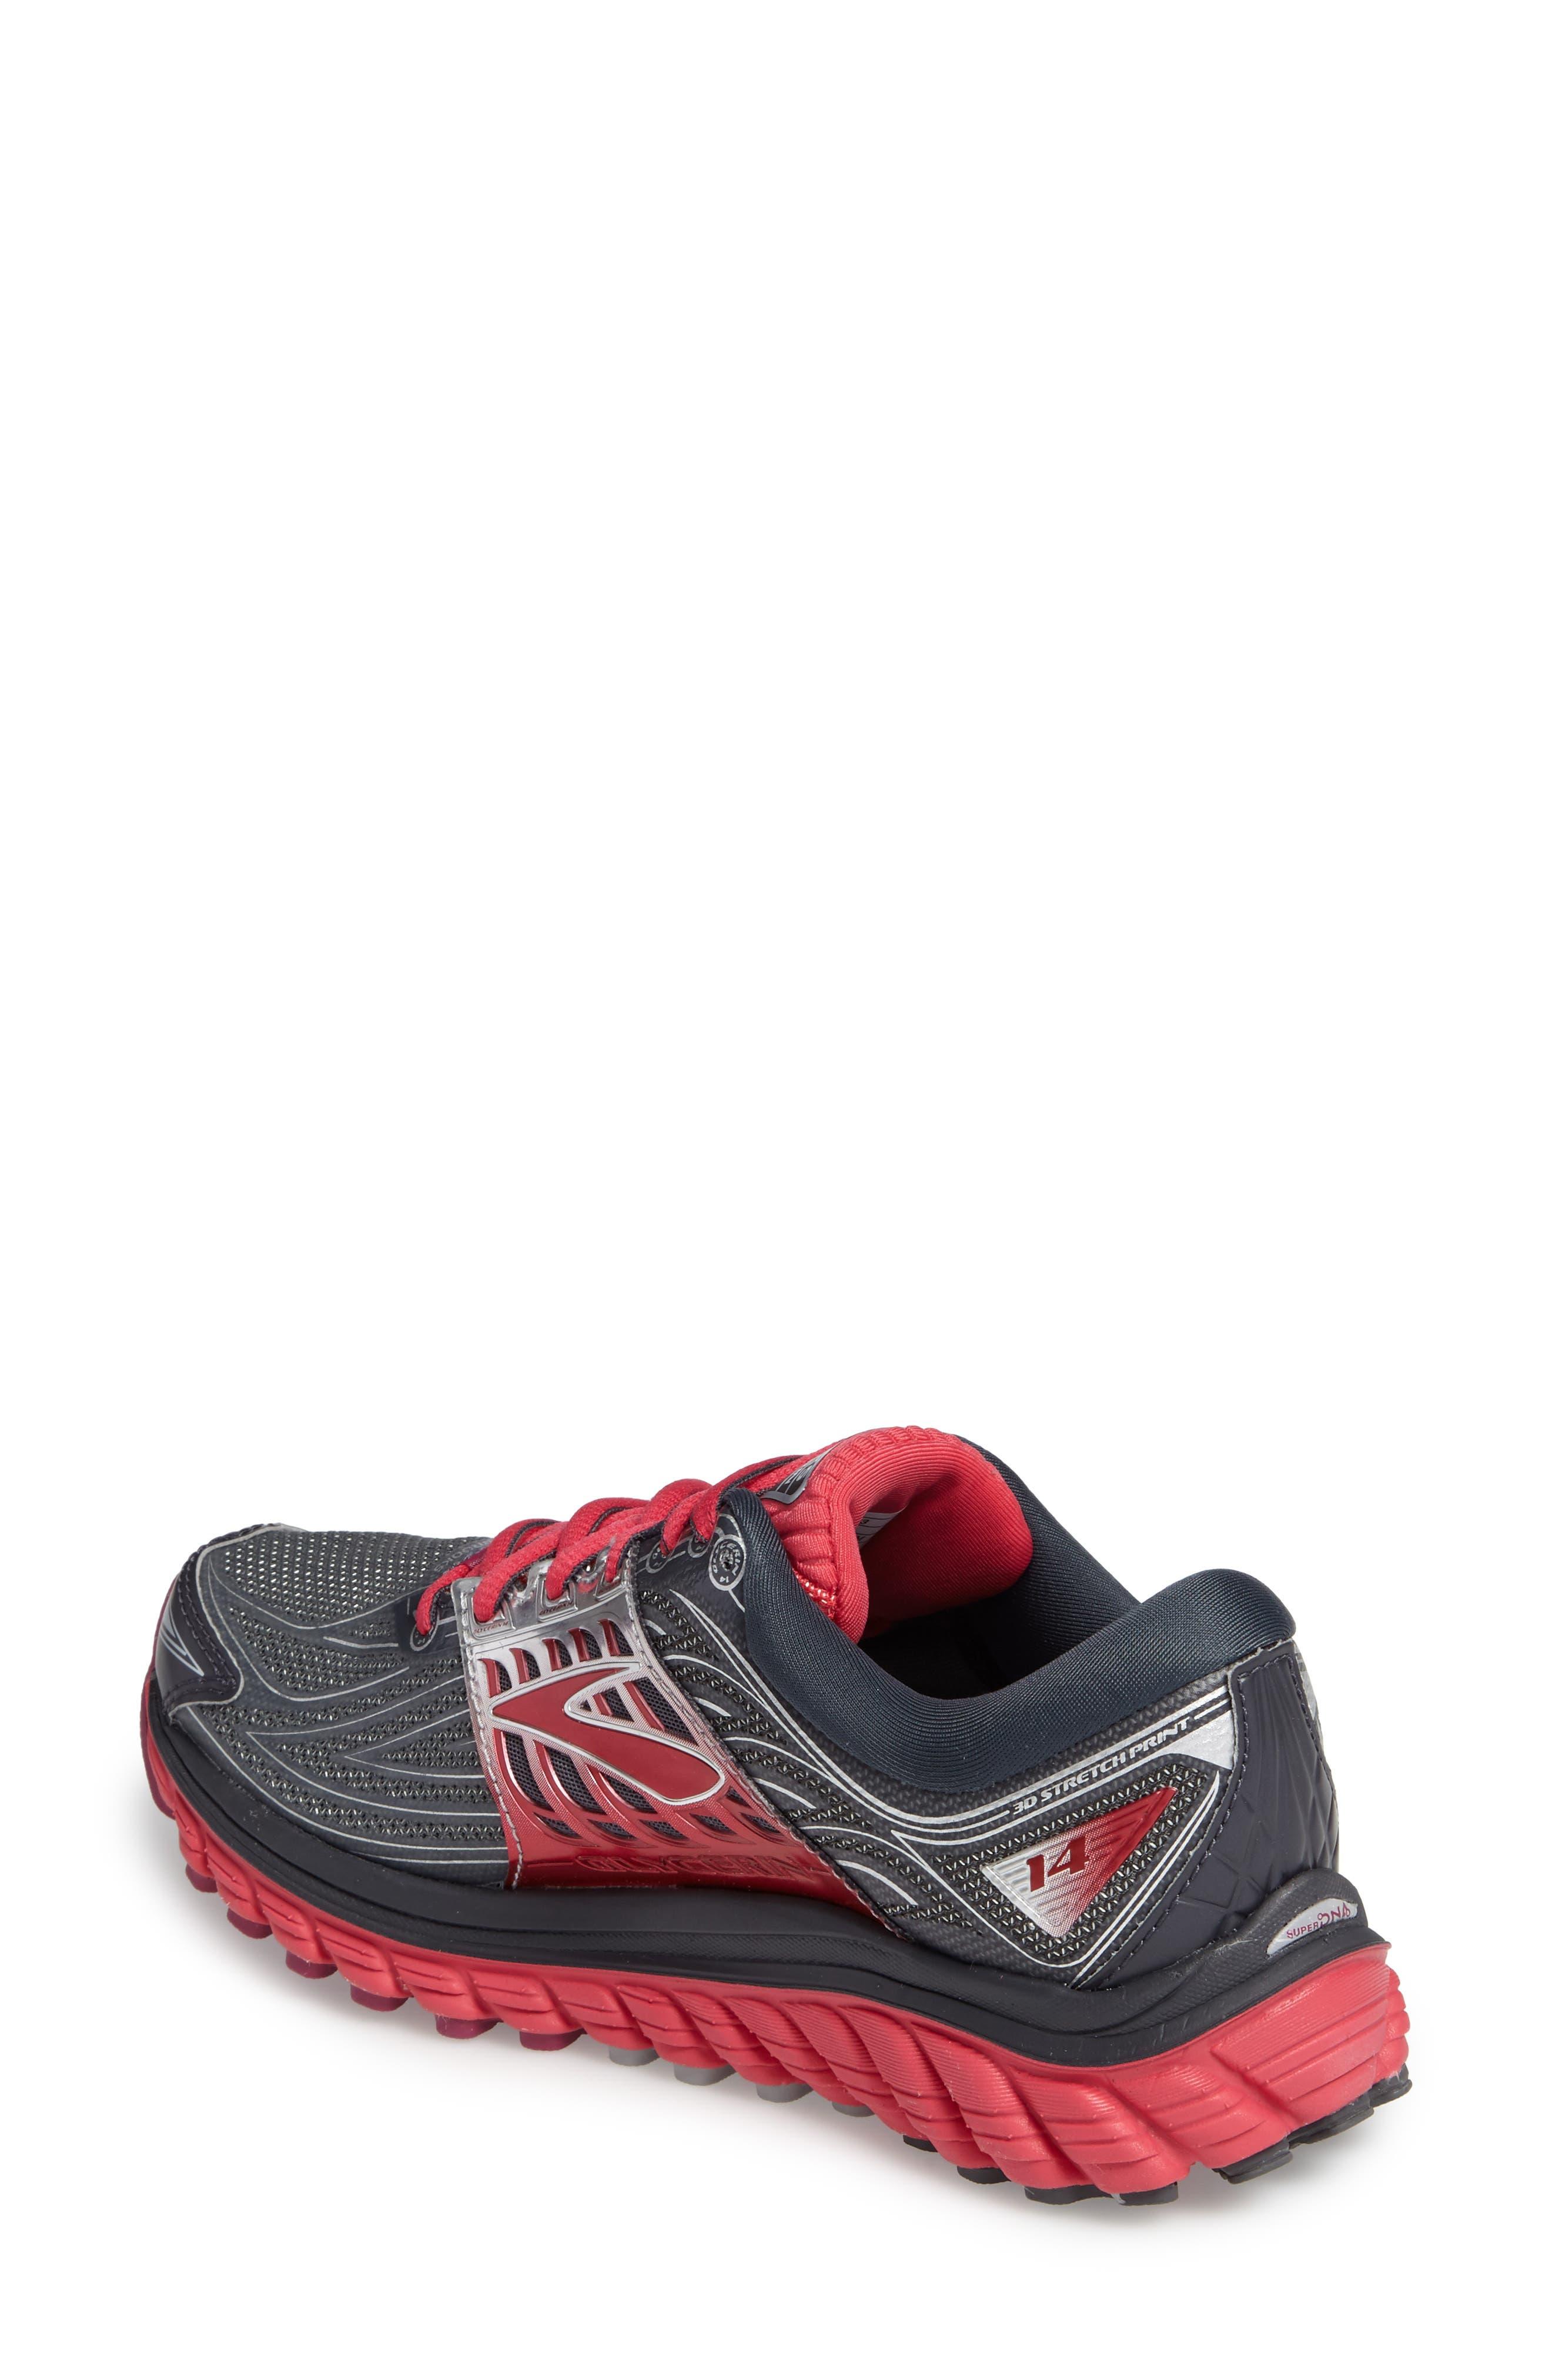 Alternate Image 2  - Brooks 'Glycerin 14' Running Shoe (Women)